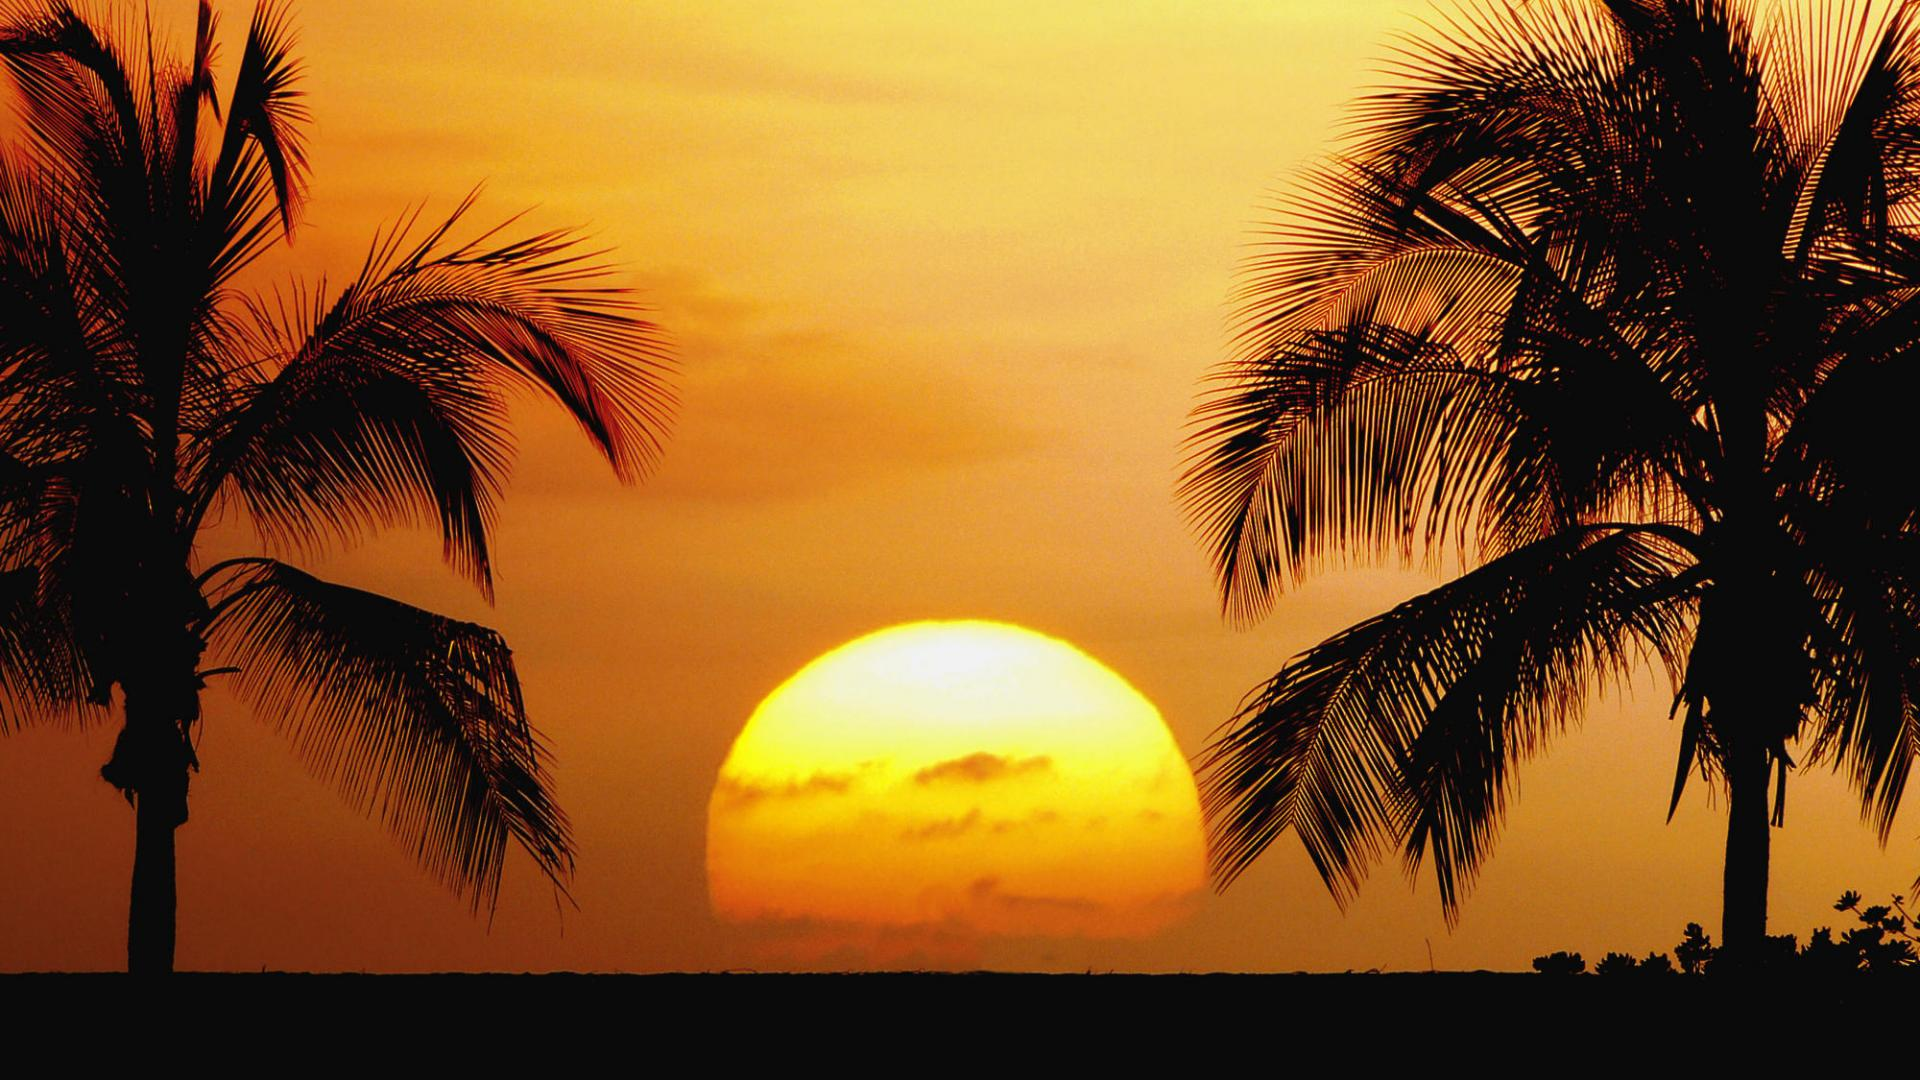 Tropical Beaches Beautiful Palm Trees Sunrise Sunset Landscape 278064 1920x1080